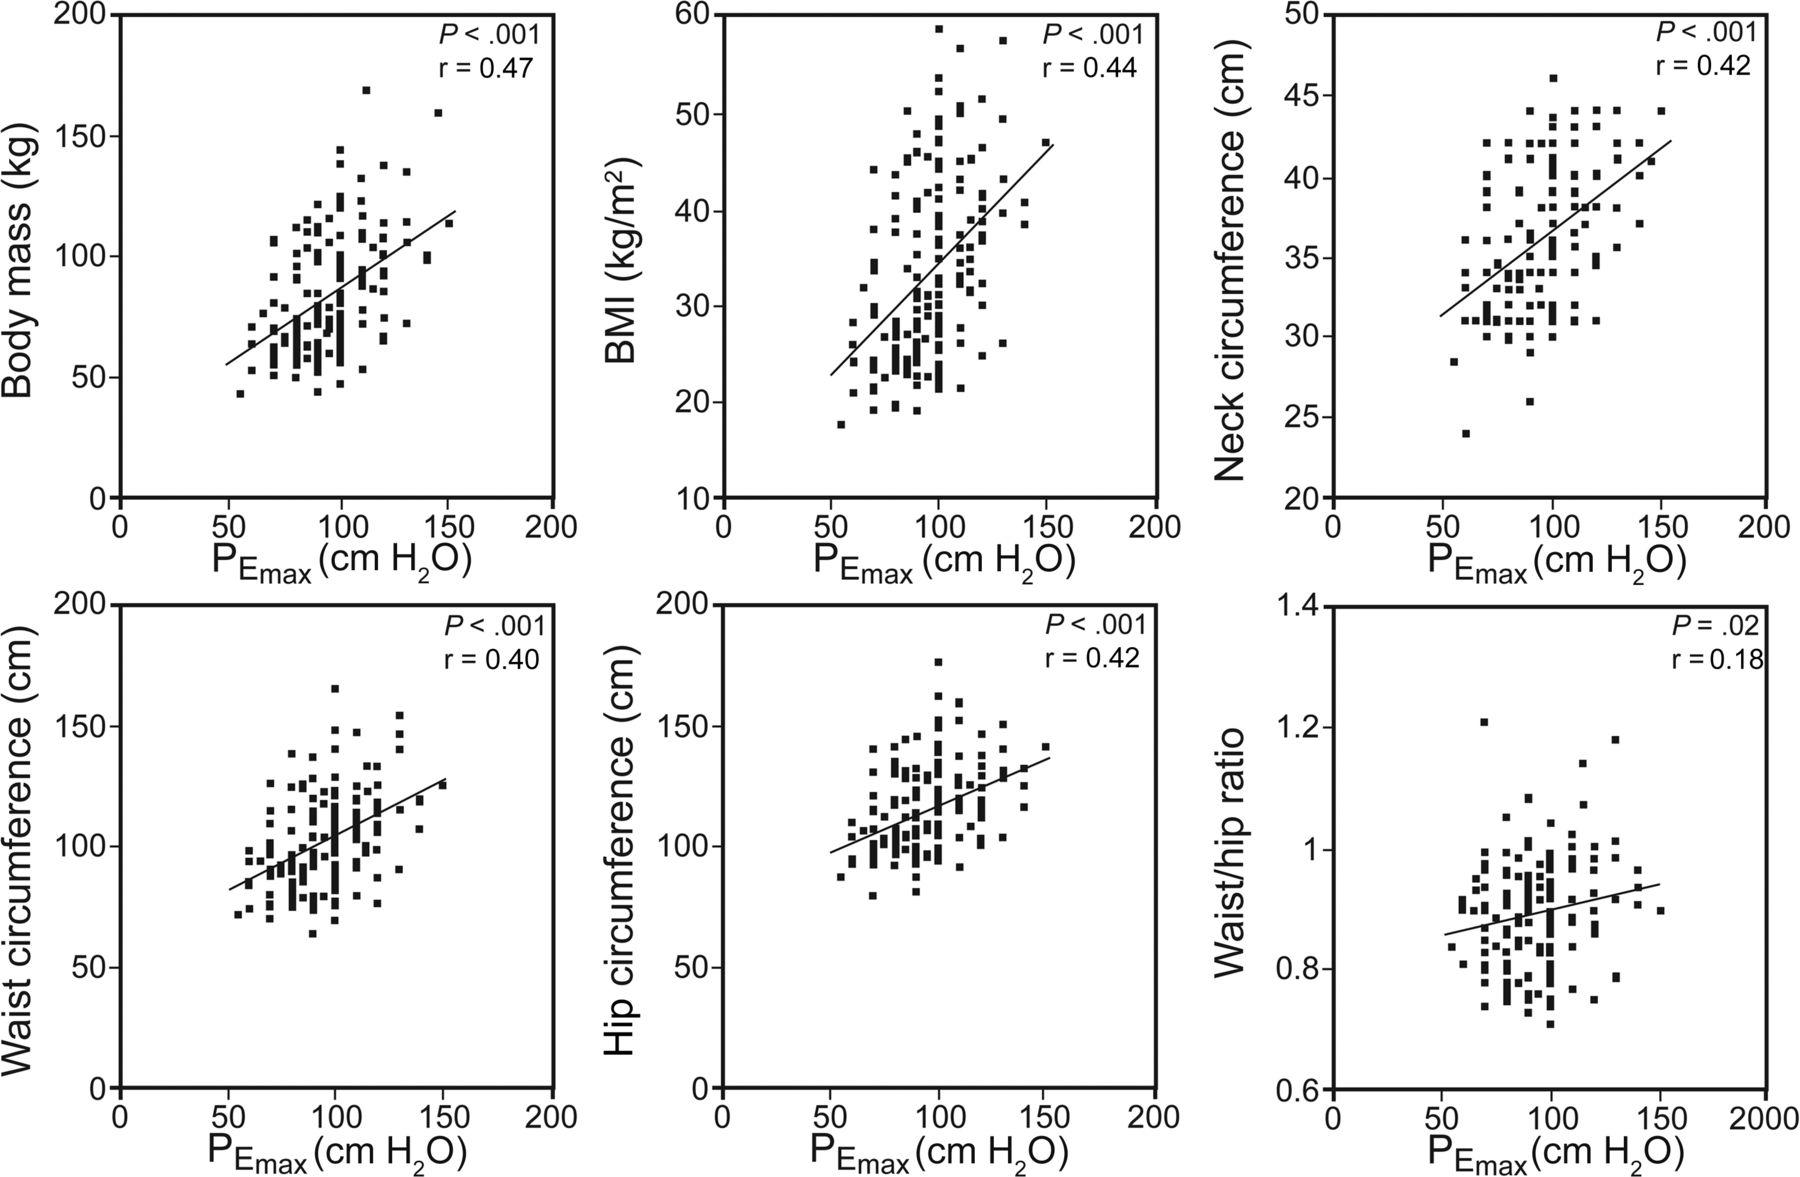 Predictive Equations for Maximum Respiratory Pressures of